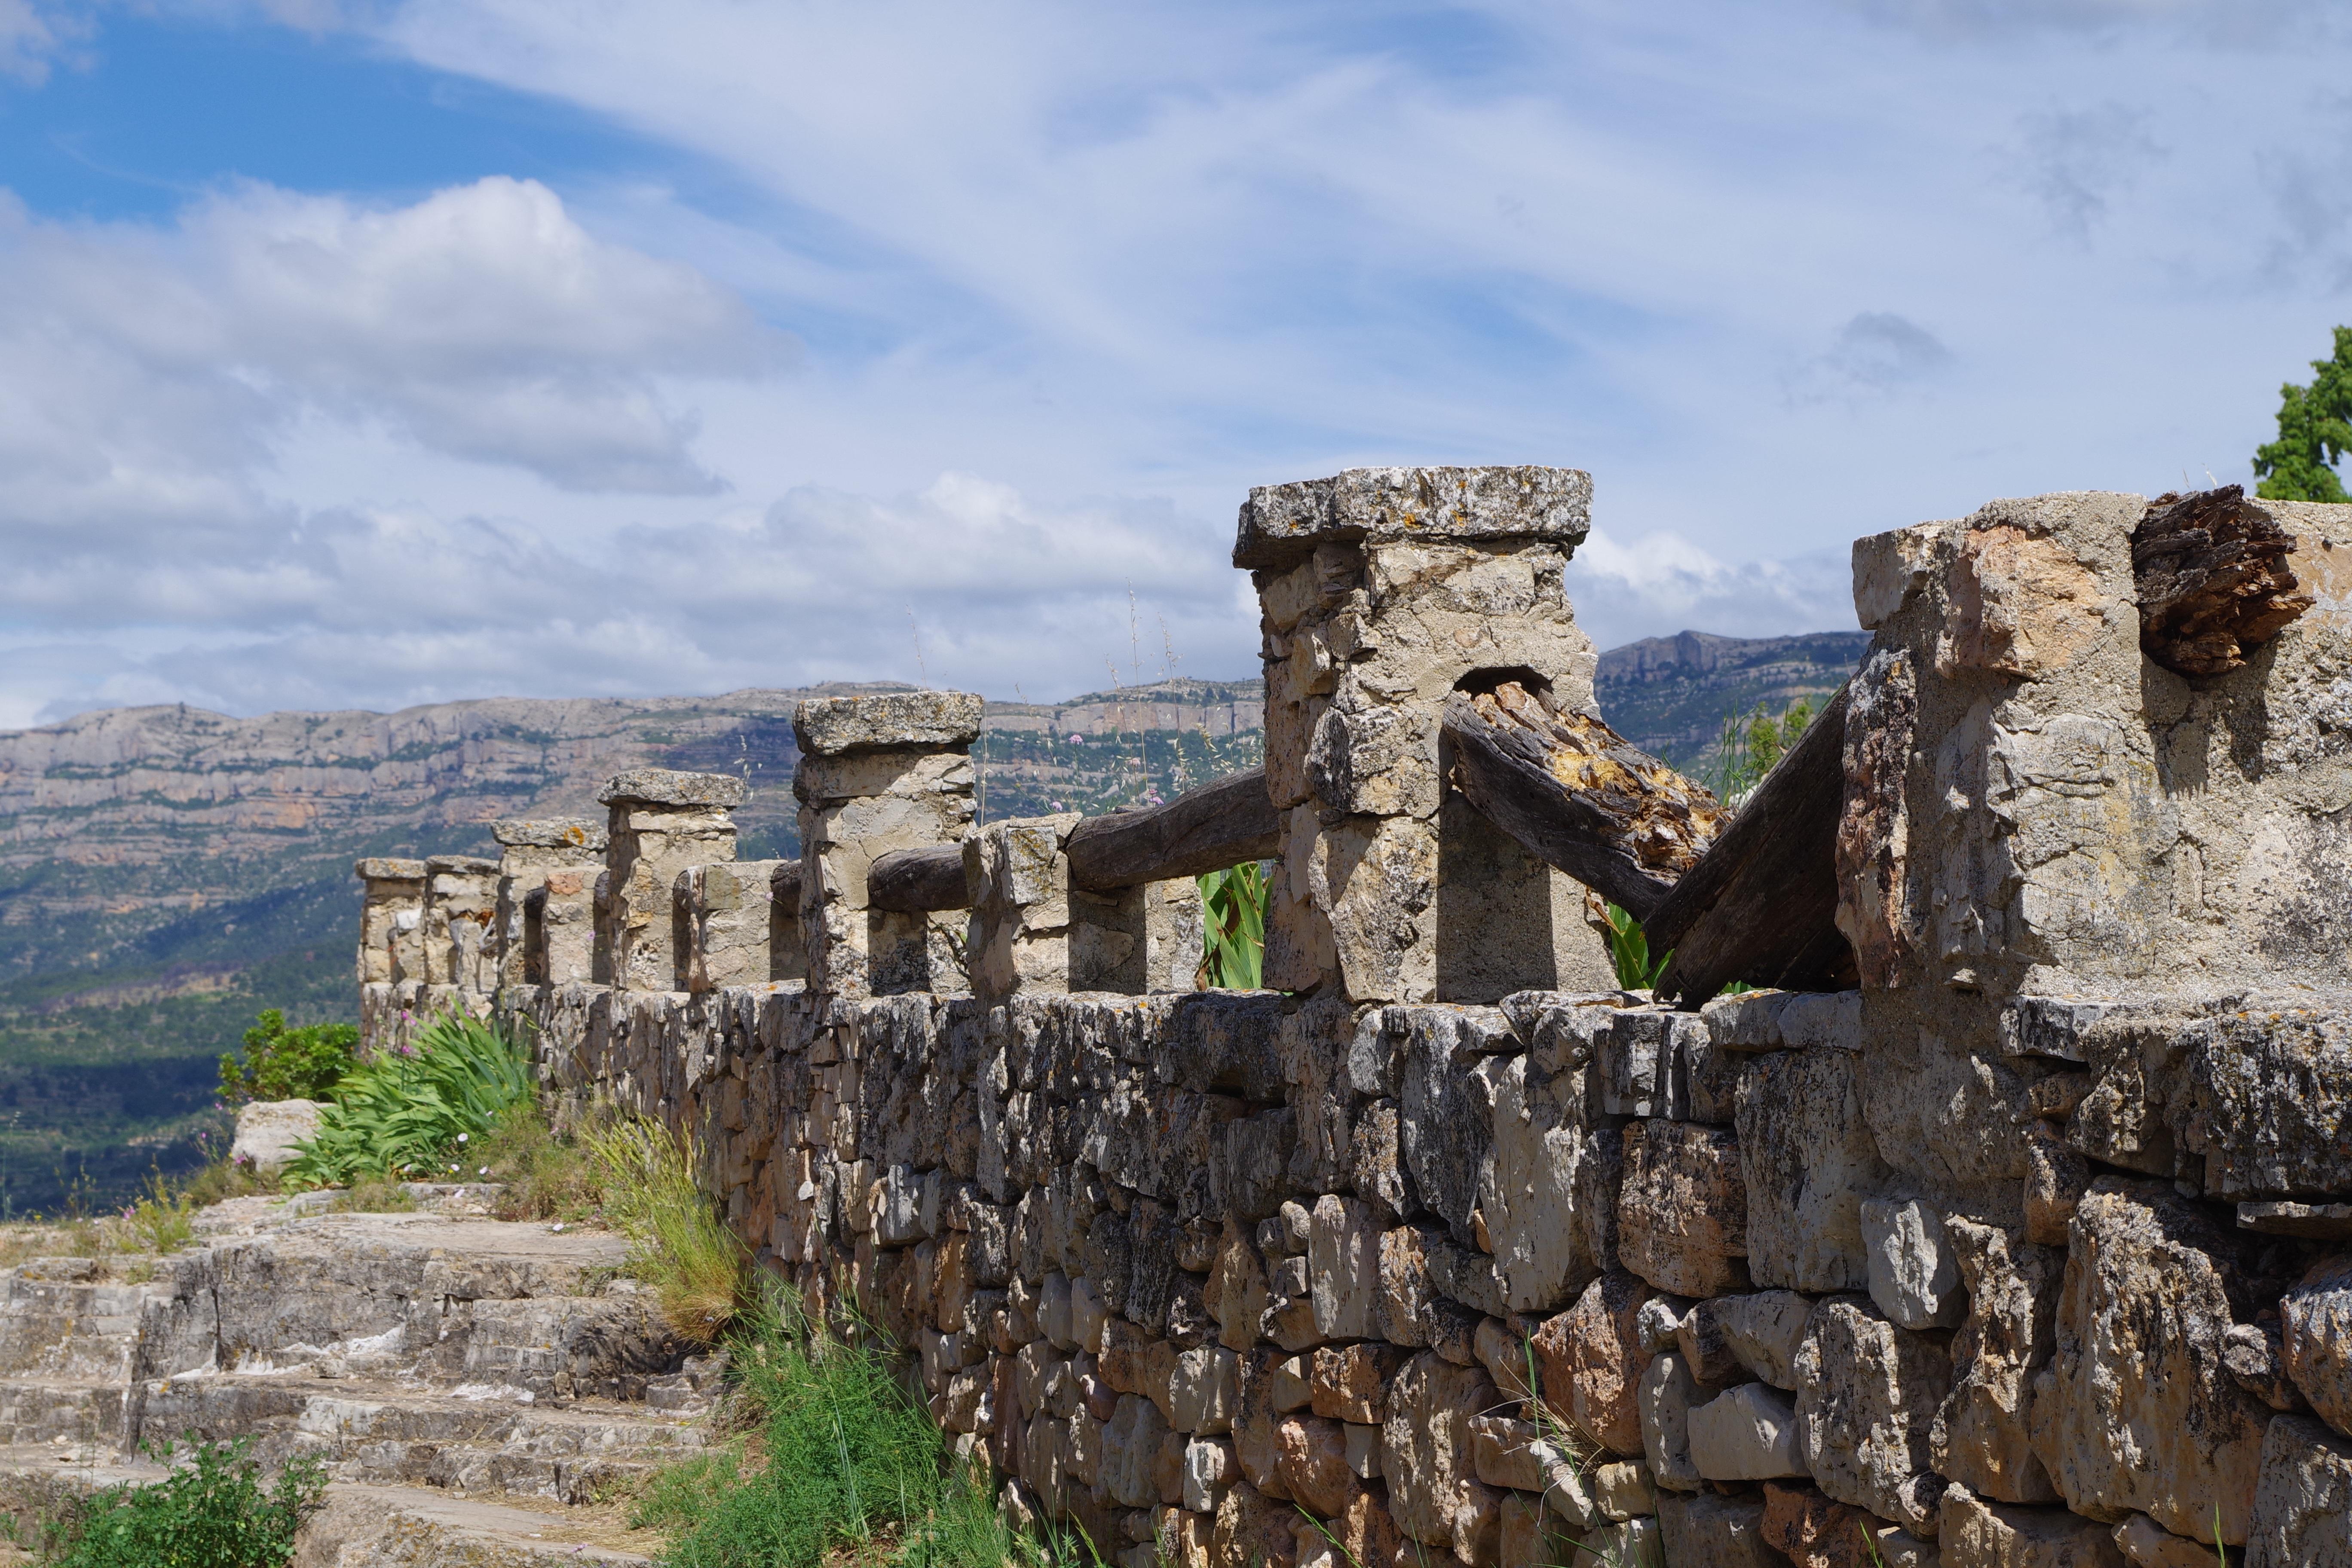 развалины в горах фото завалялась